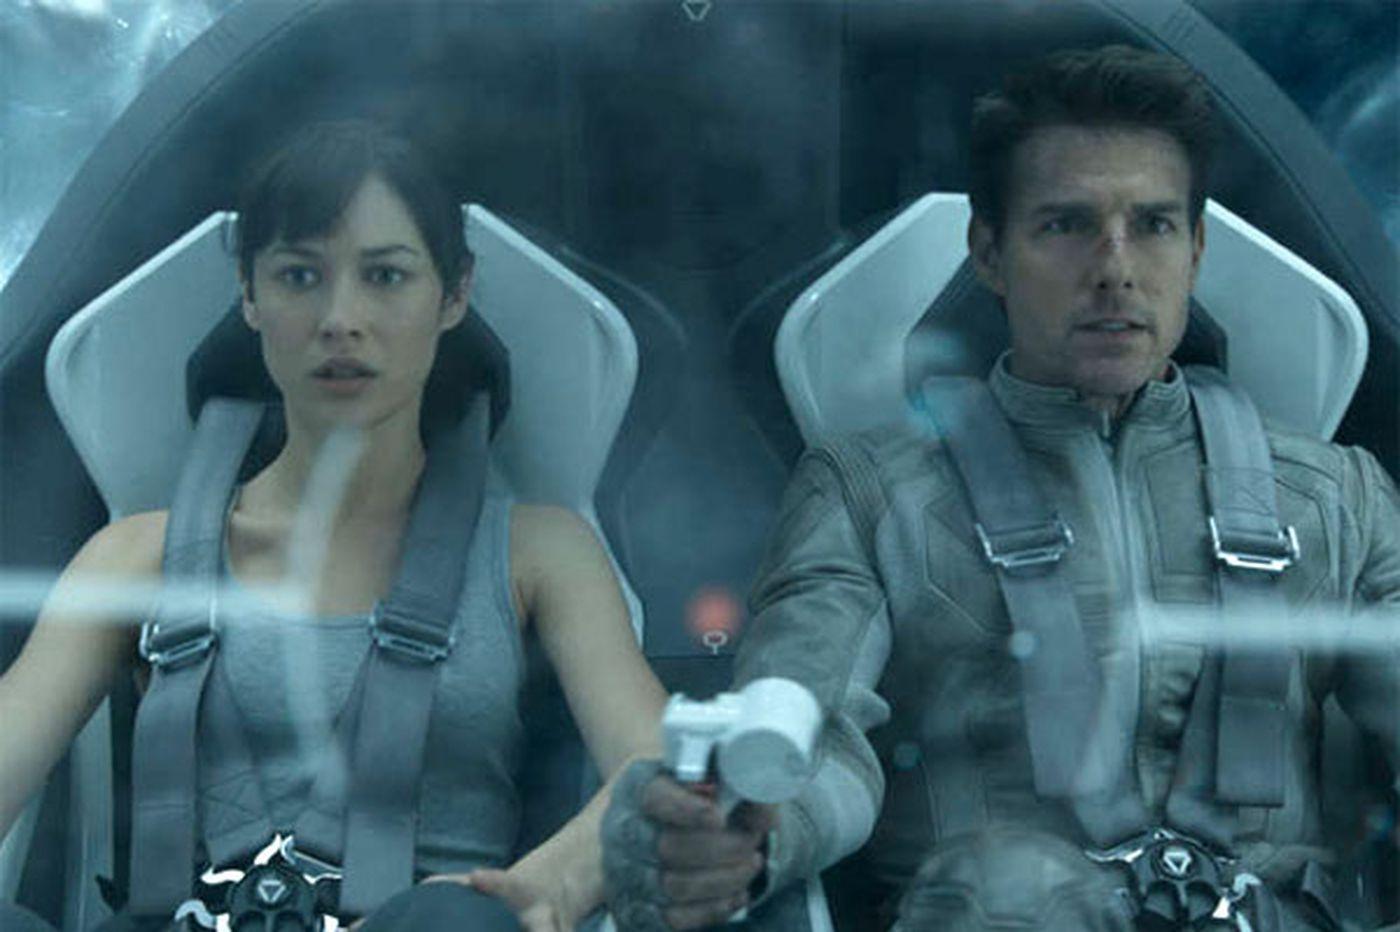 Elements of past sci-fi films in 'Oblivion'